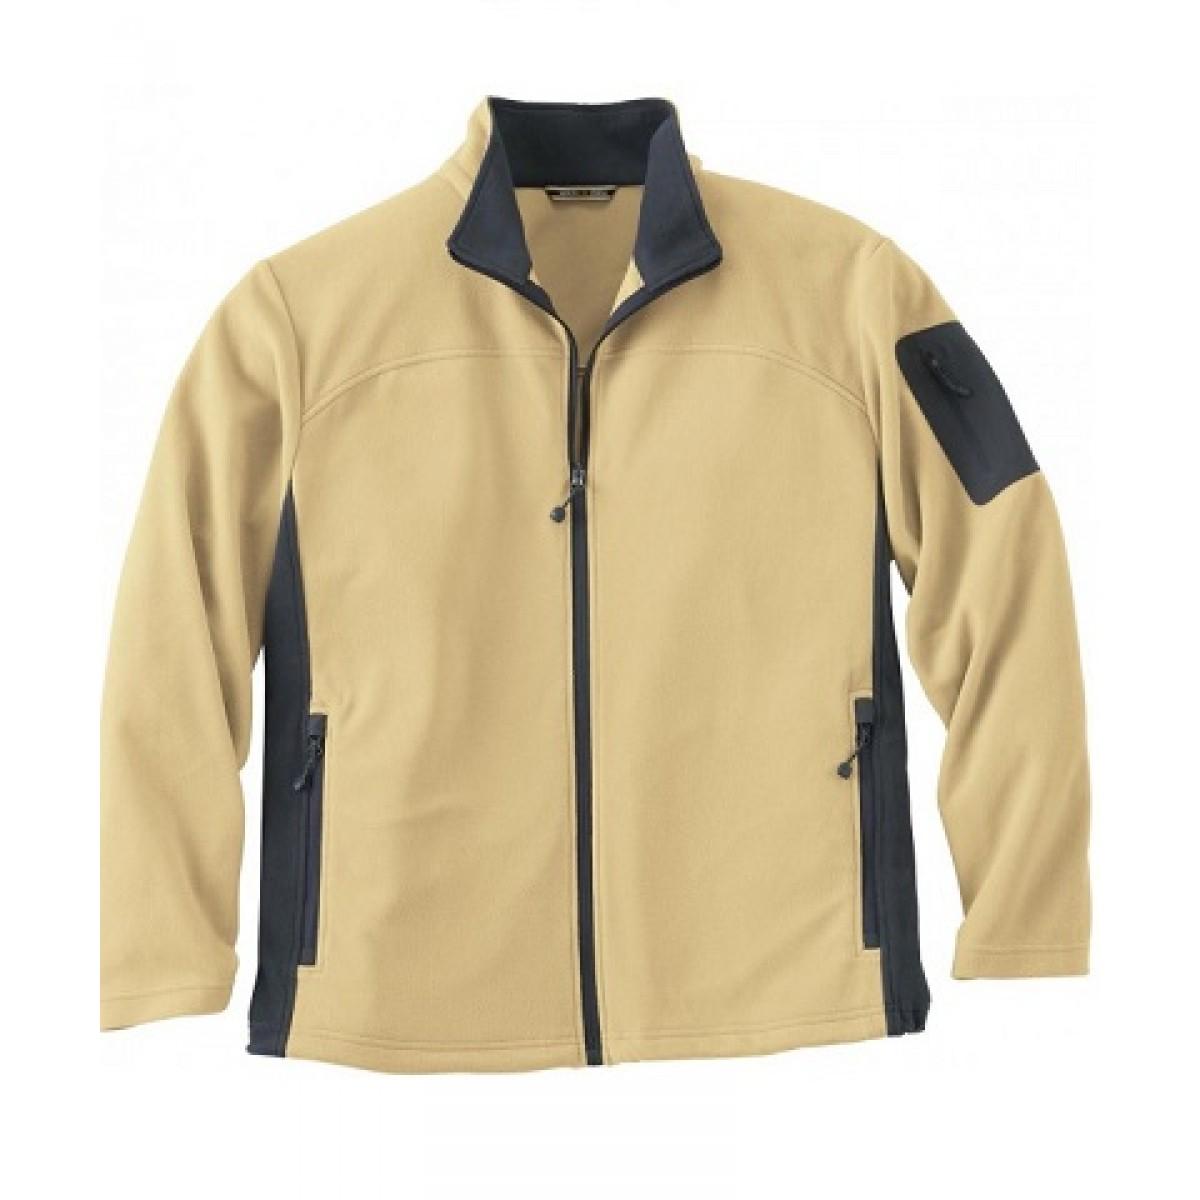 Men's Microfleece Jacket Caramel